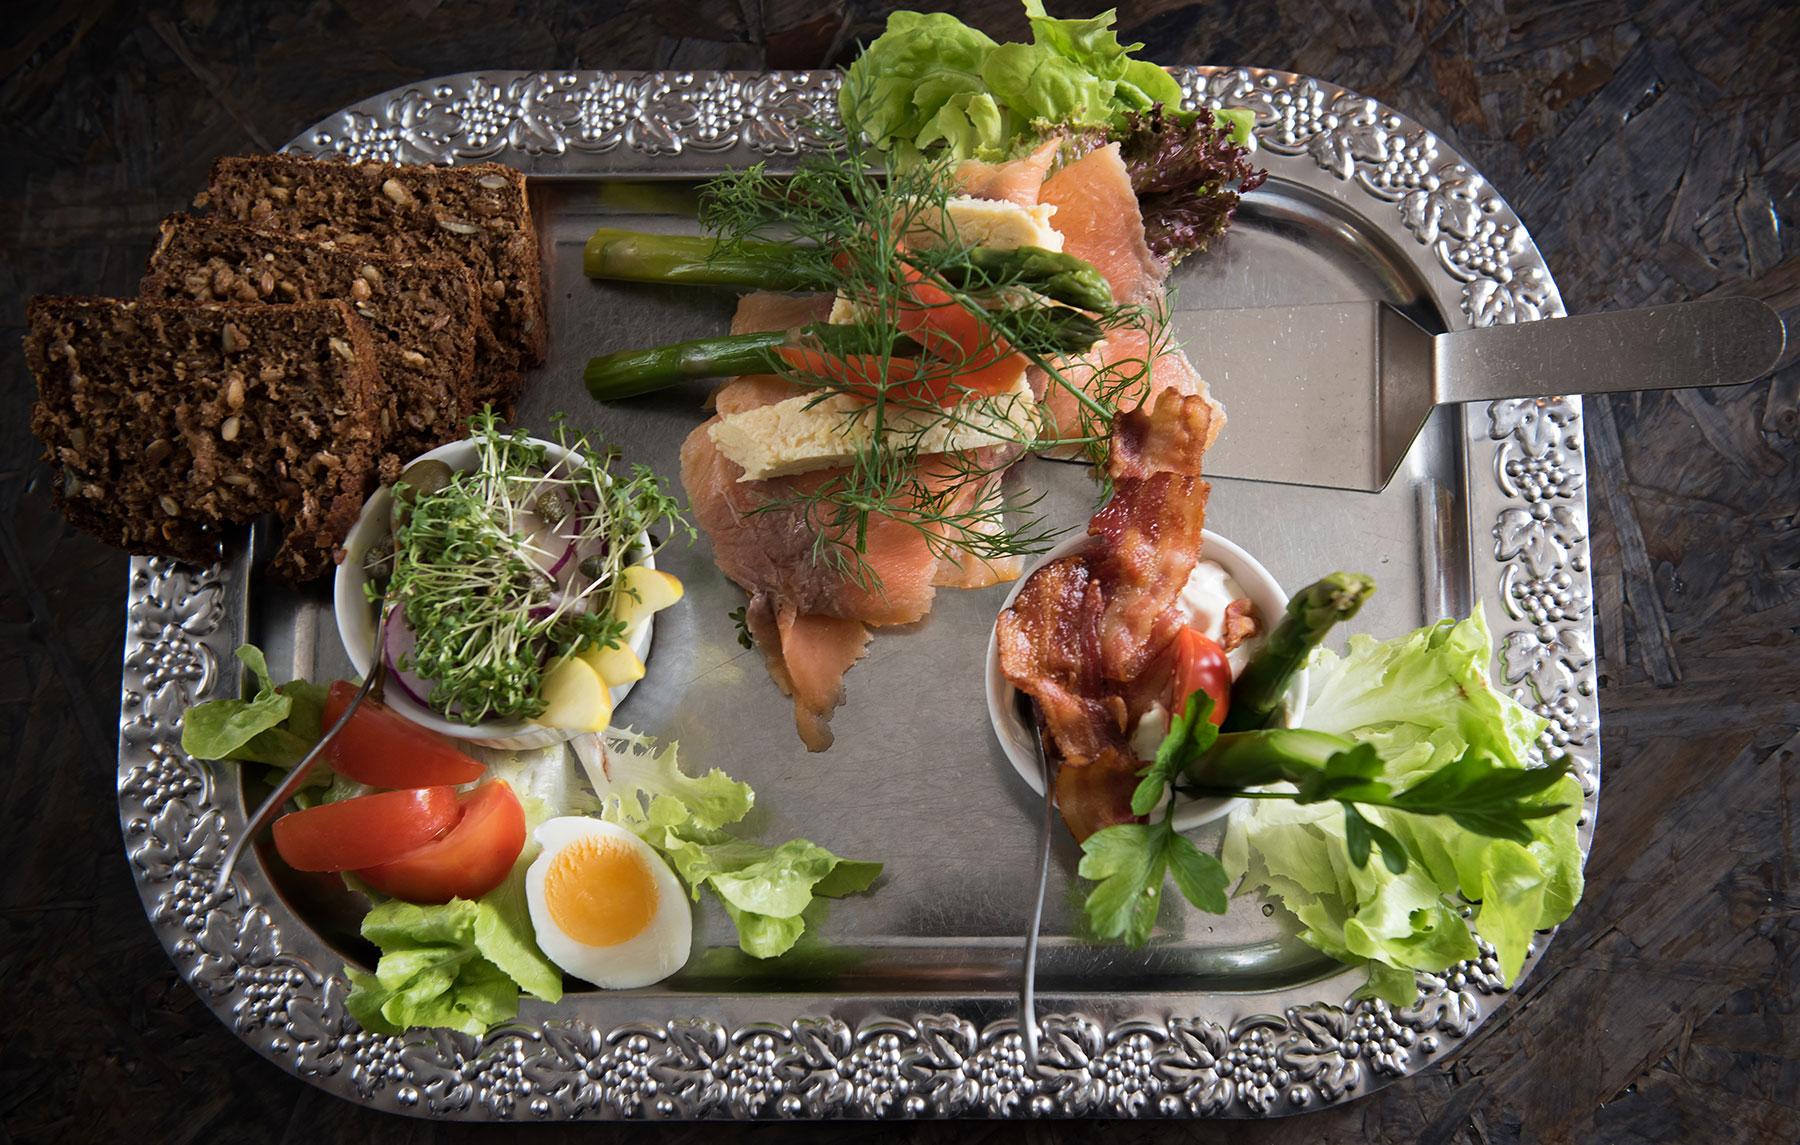 Svaneke-Bryghus-Restaurant-Smorrebrod